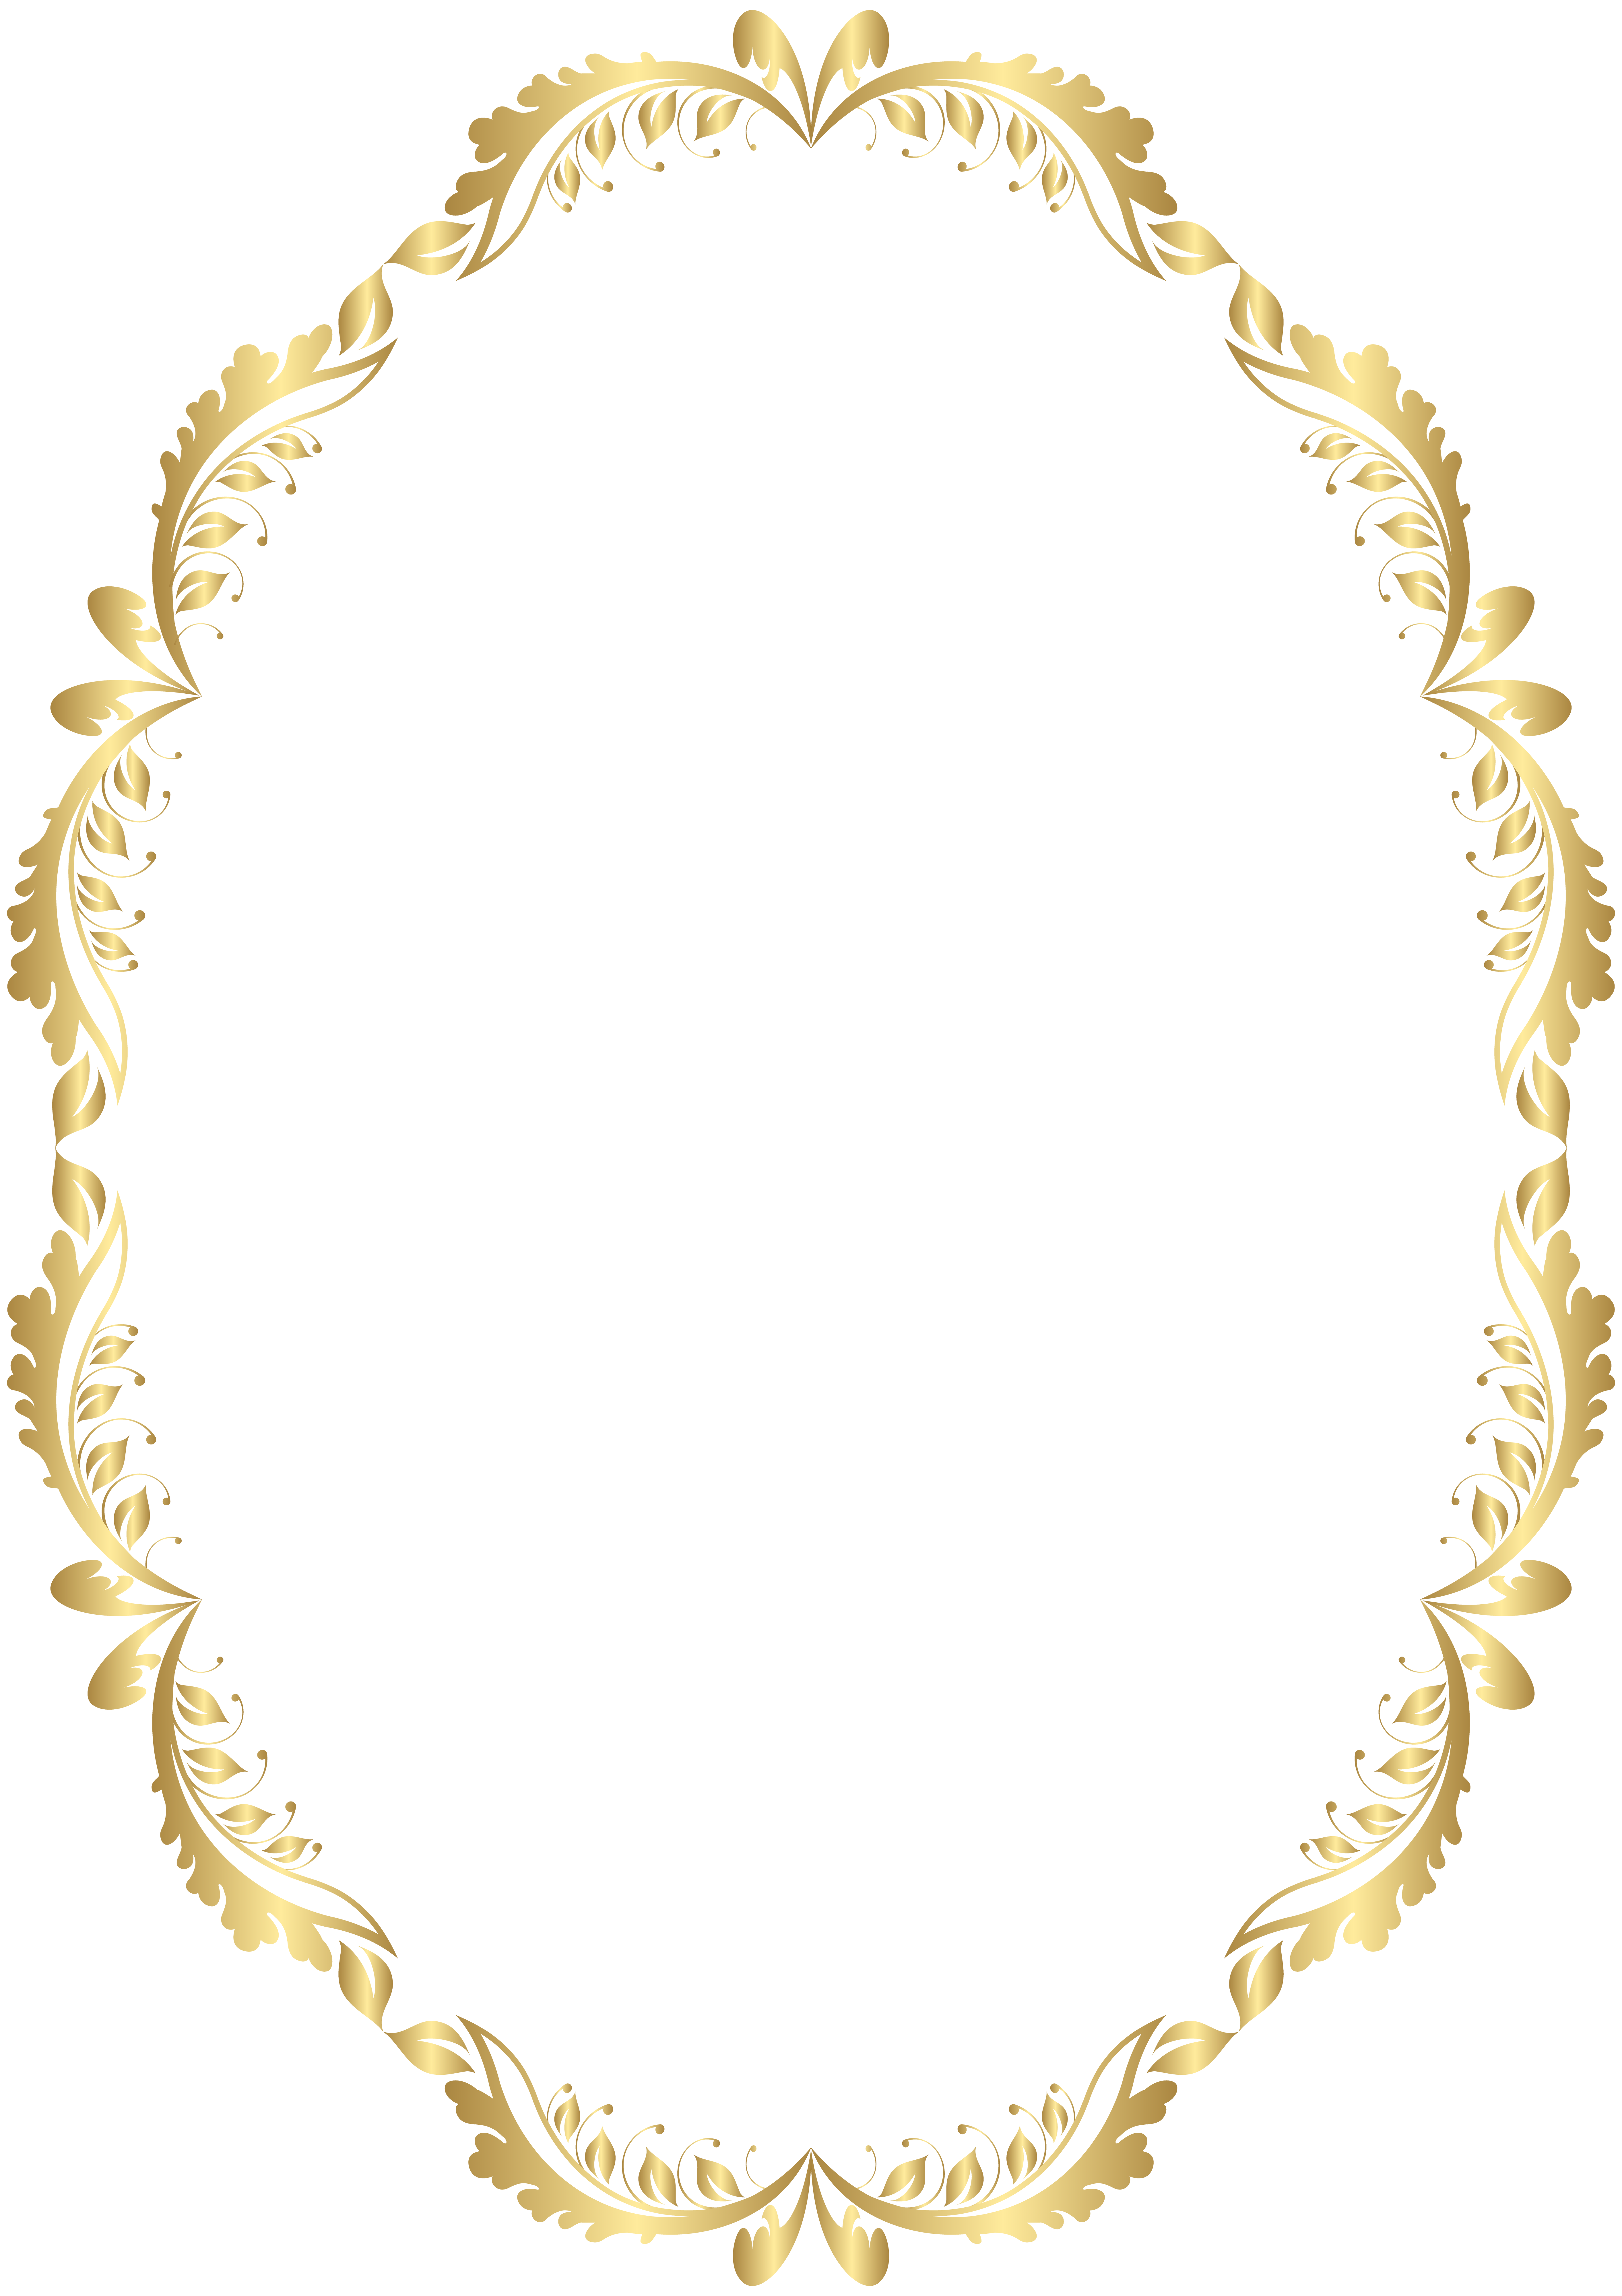 Princess crown frame clipart clip art Golden Oval Border Transparent PNG Clip Art | anandhakumar ... clip art